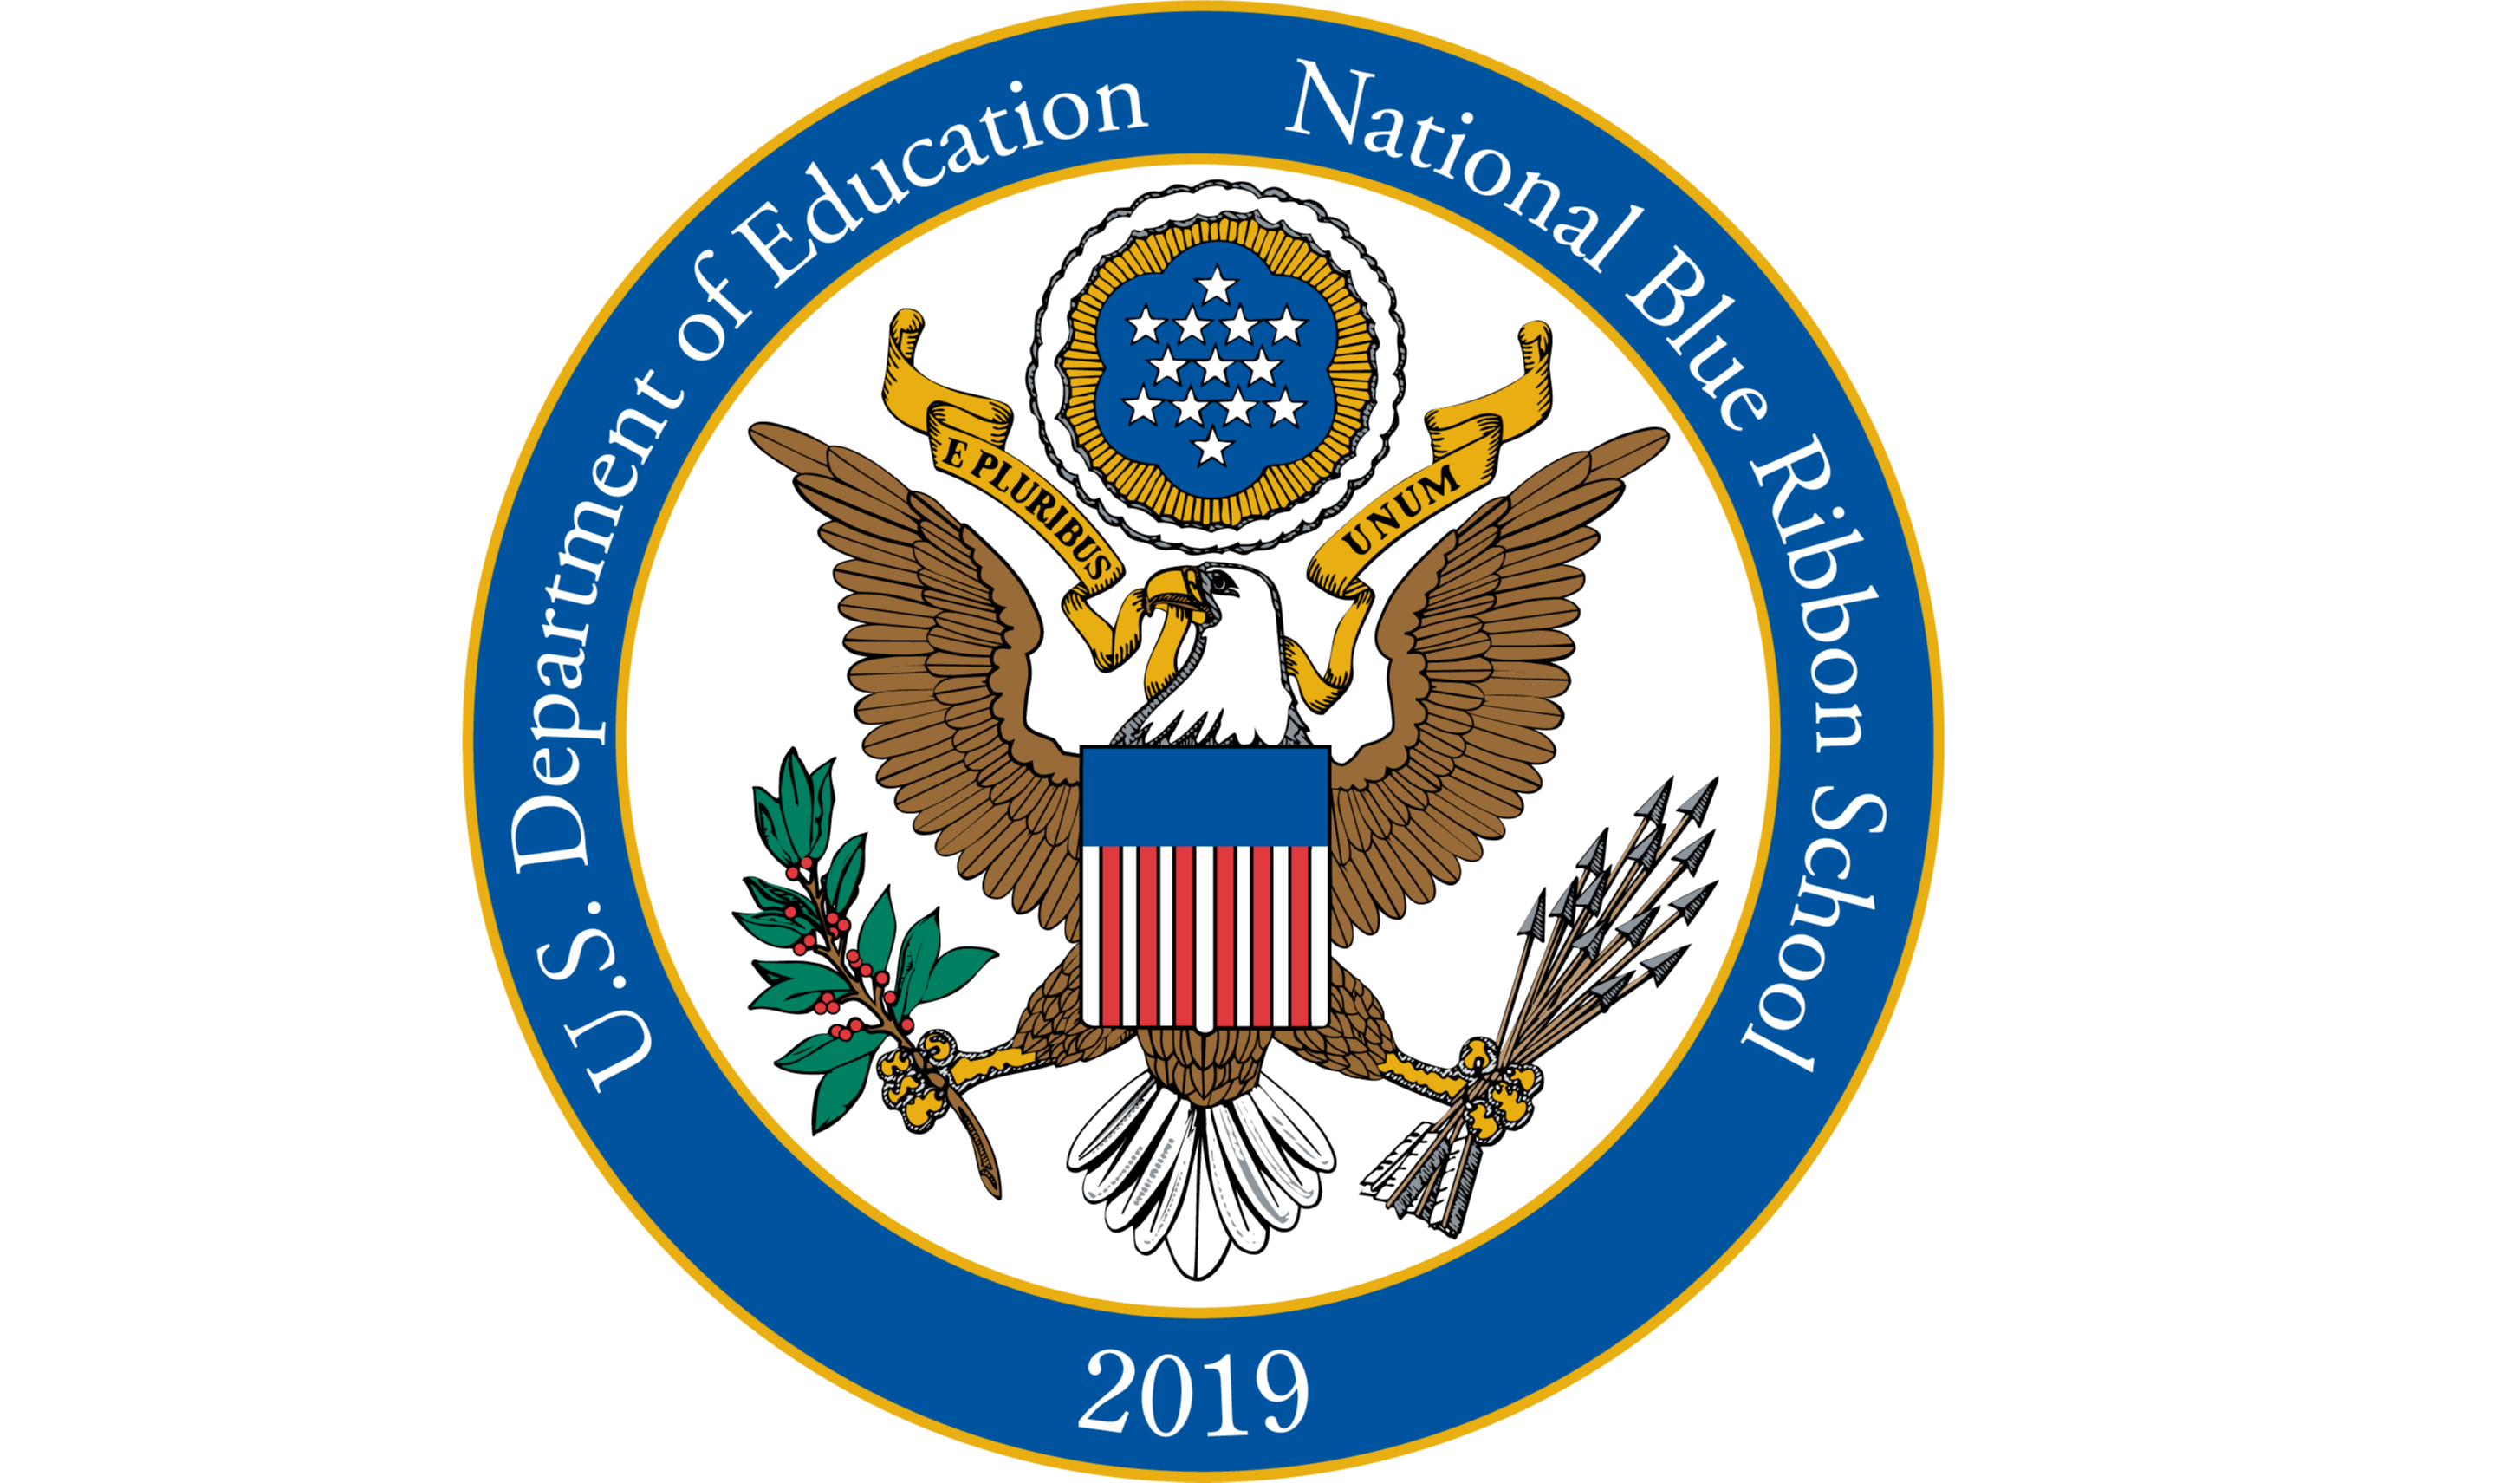 U.S. Department of Education National Blue Ribbon School 2019